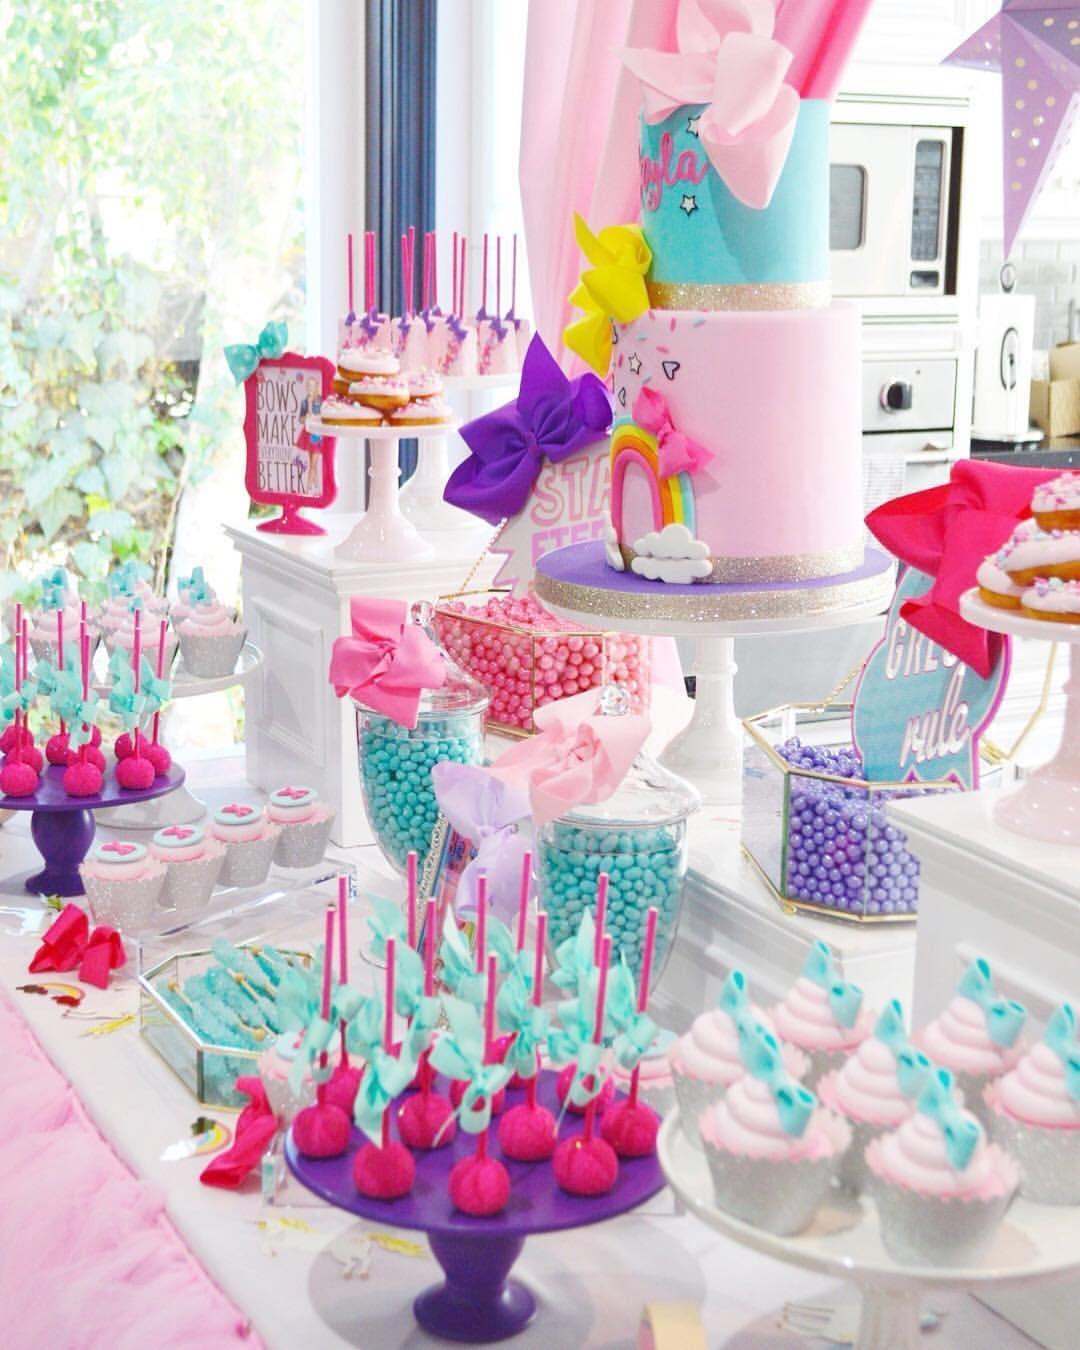 Jojo Siwa Theme Dessert Table Display Kayla S Jojo Siwa Theme Birthday Sofun Itsjojosiwa Jojo Siwa Birthday Jojo Siwa Birthday Cake Dessert Table Birthday